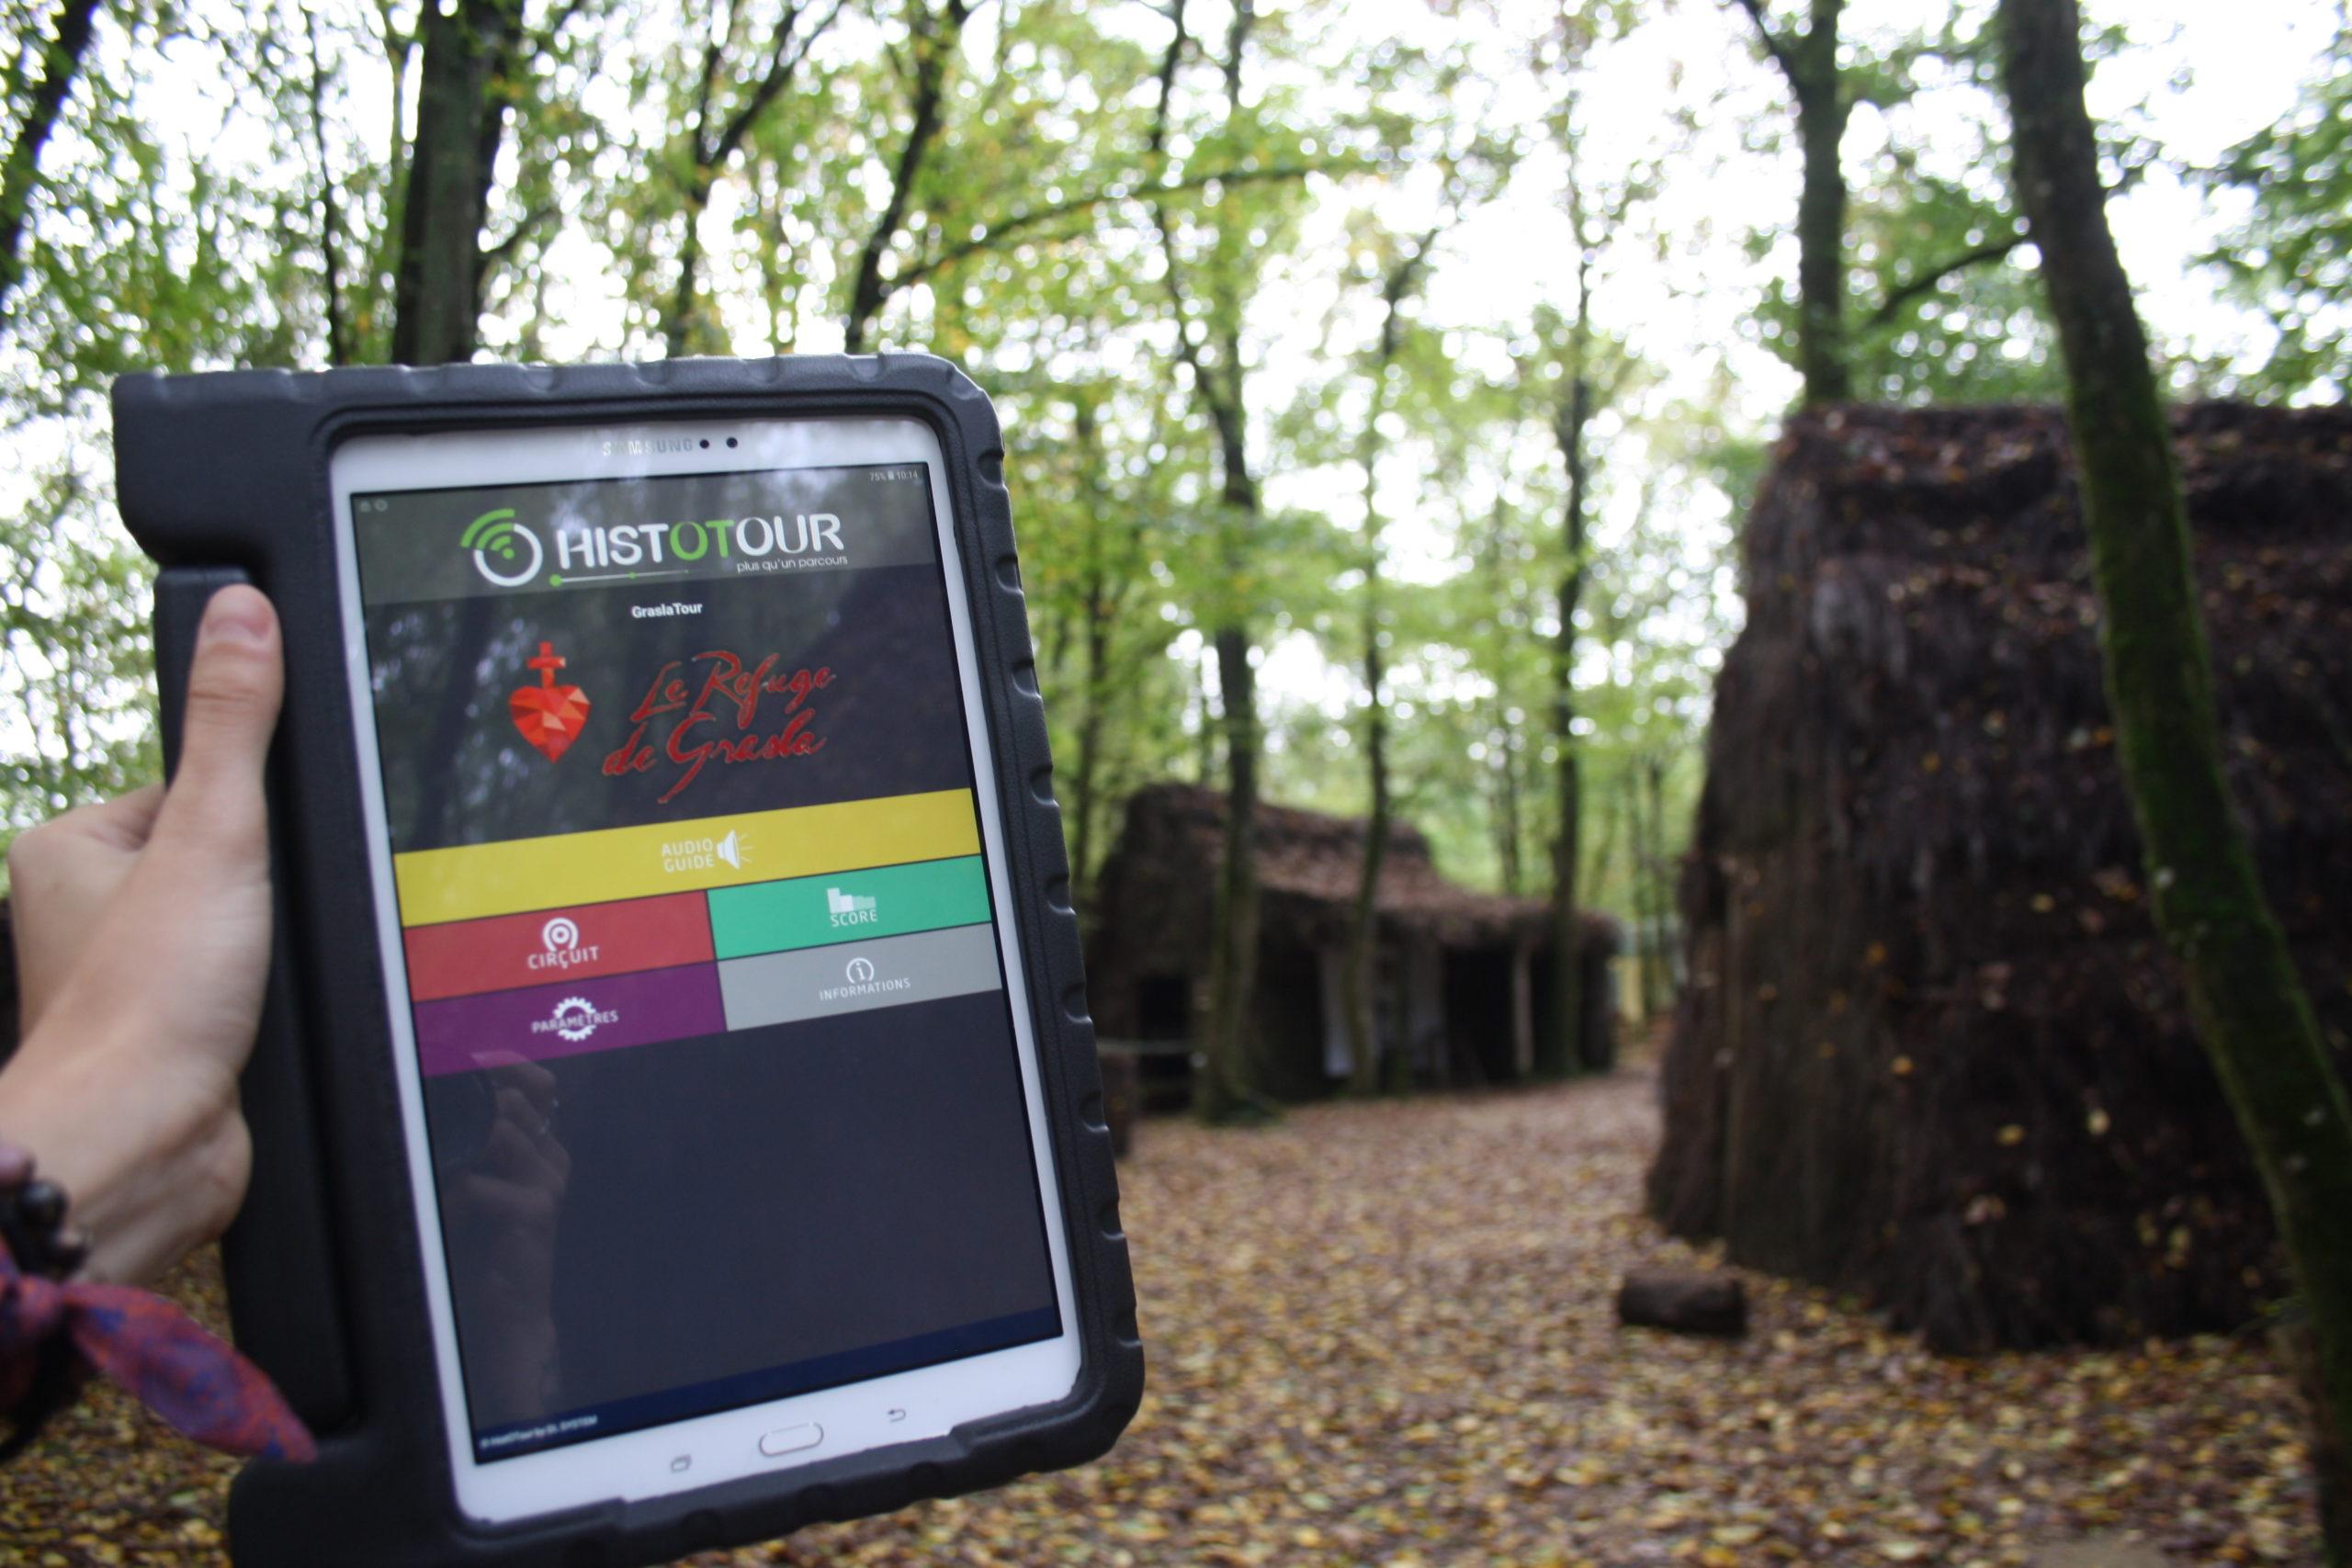 Visite interactive Vendée - Visite guidée virtuelle - Le Refuge de Grasla